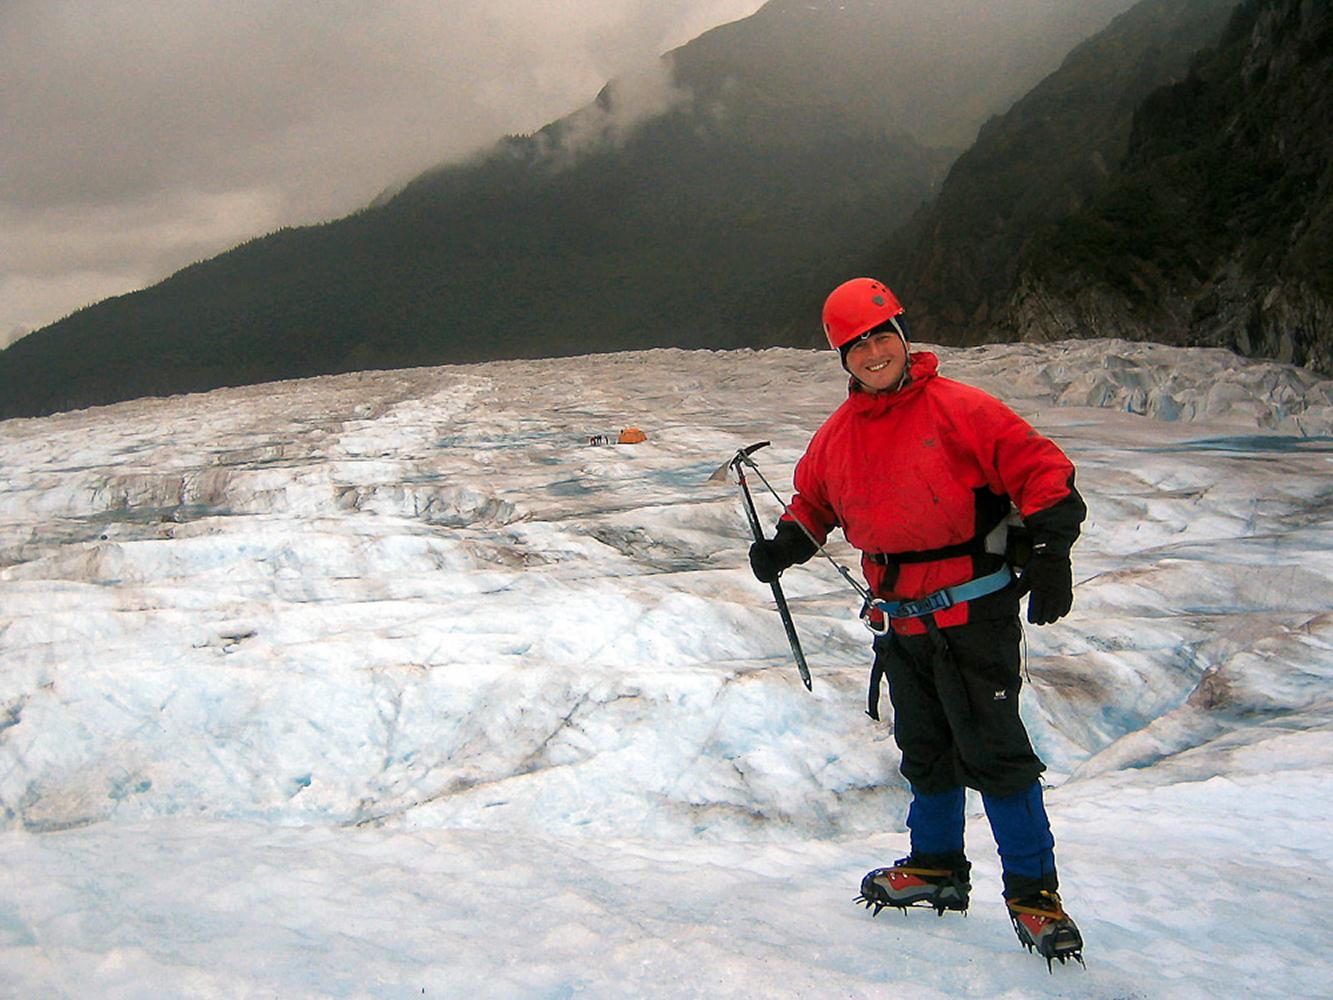 Juneau, Alaska, USA. Hiking up the Mendenhall glacier